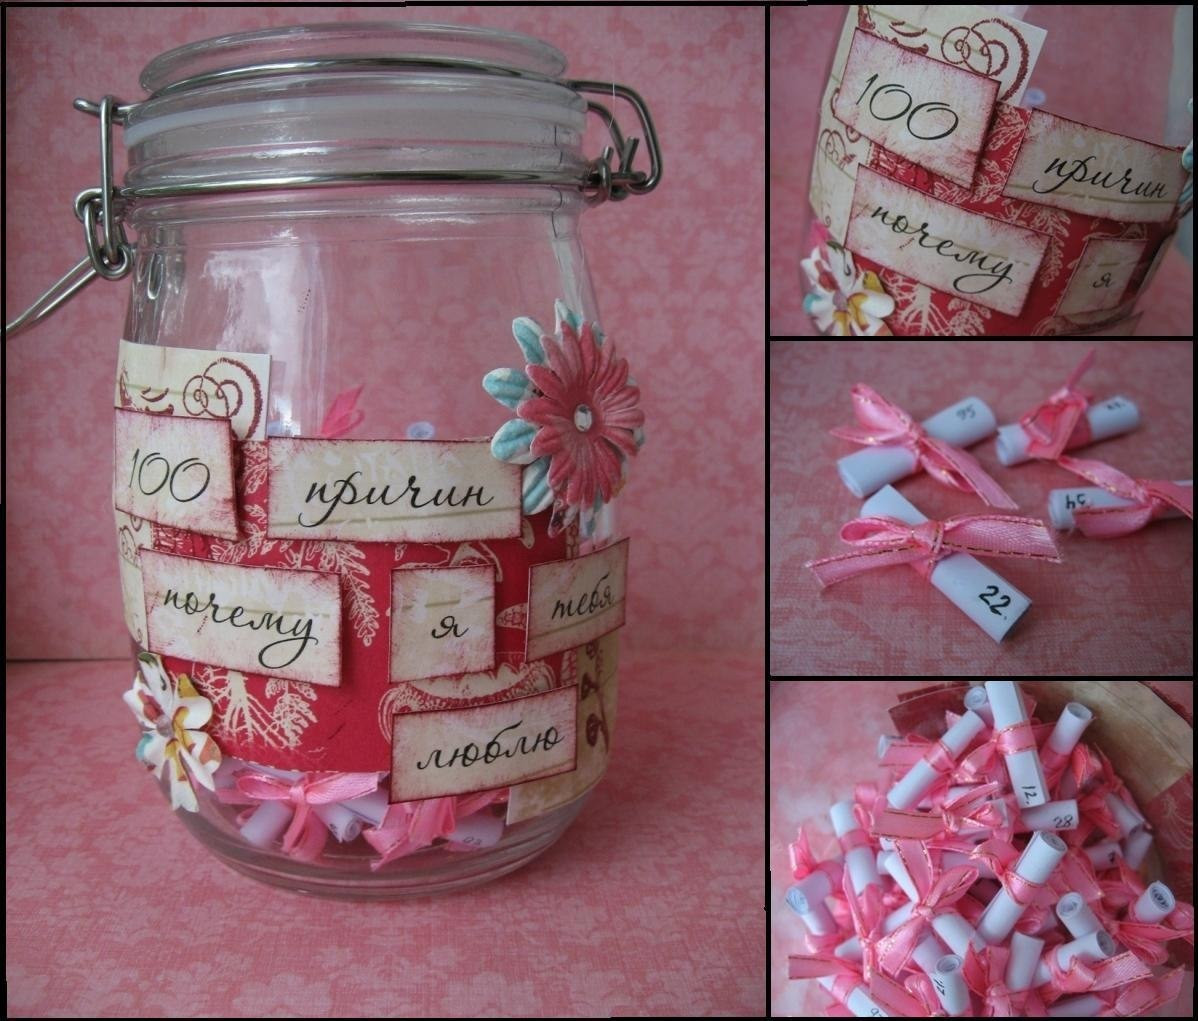 Amazing Gift Ideas For Girlfriend  100 причин почему я тебя люблю своими руками